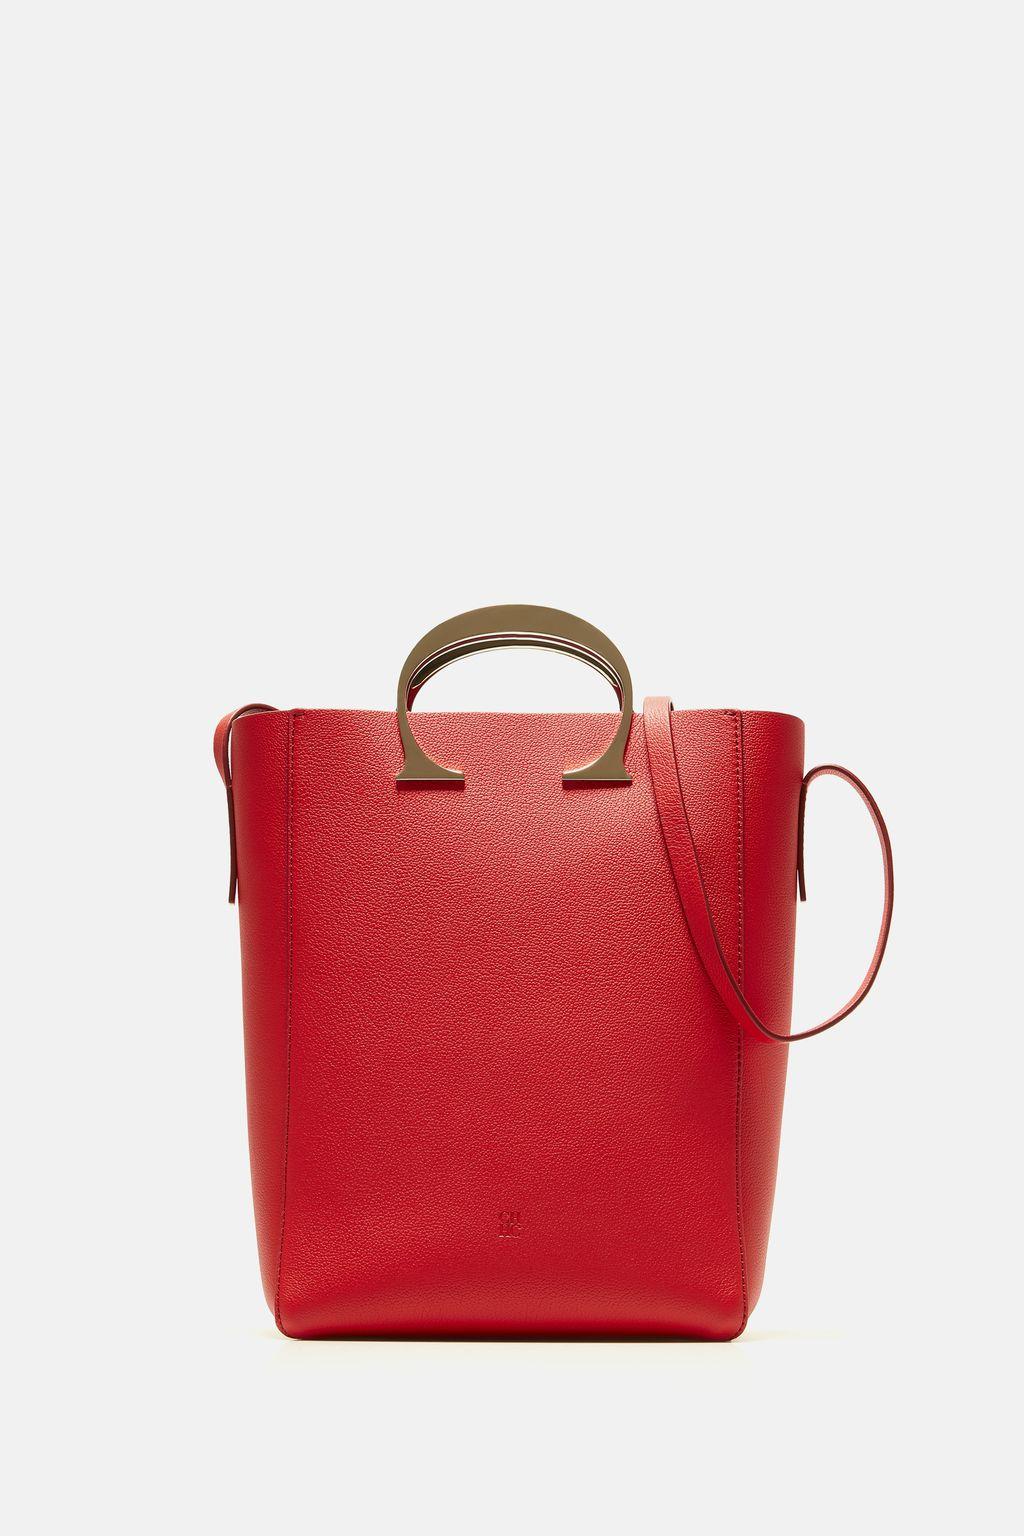 Insignia Tote | Small shoulder bag